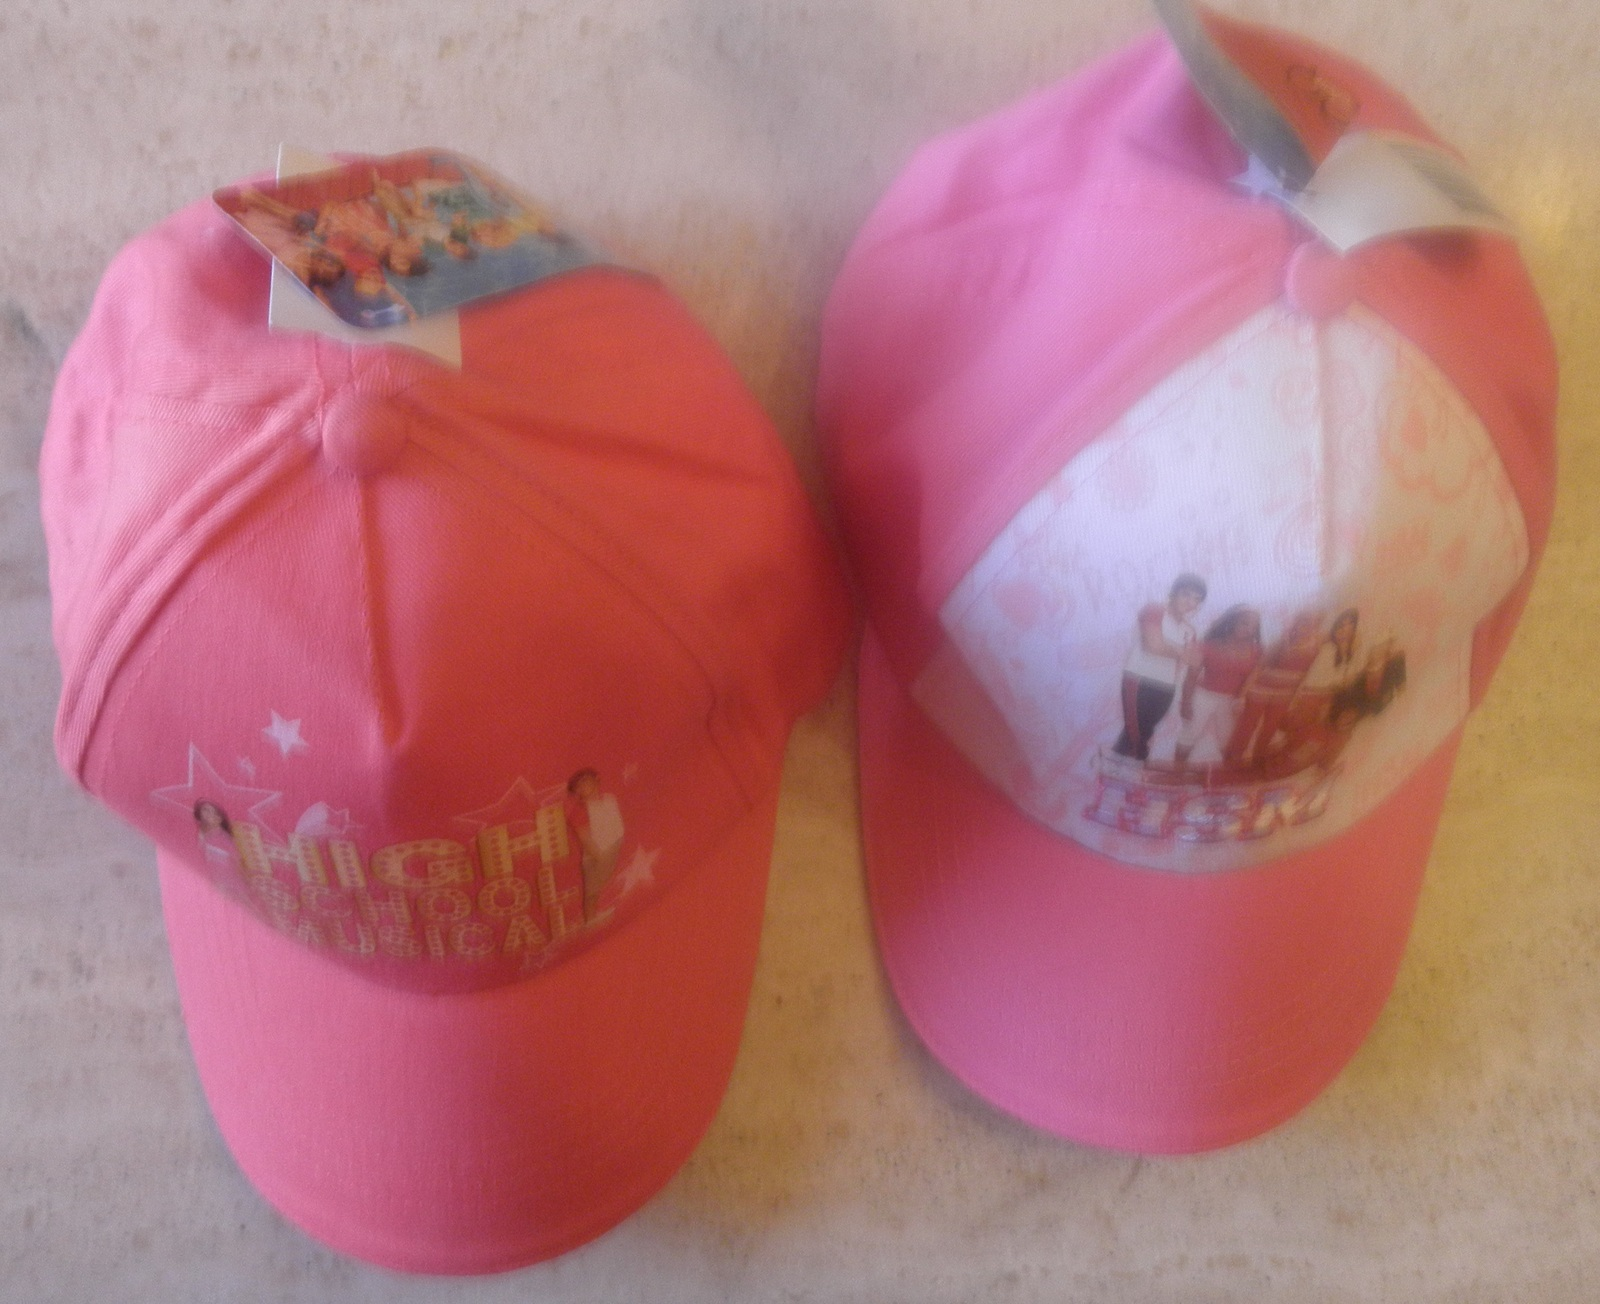 2 baseball caps high school musical nwt